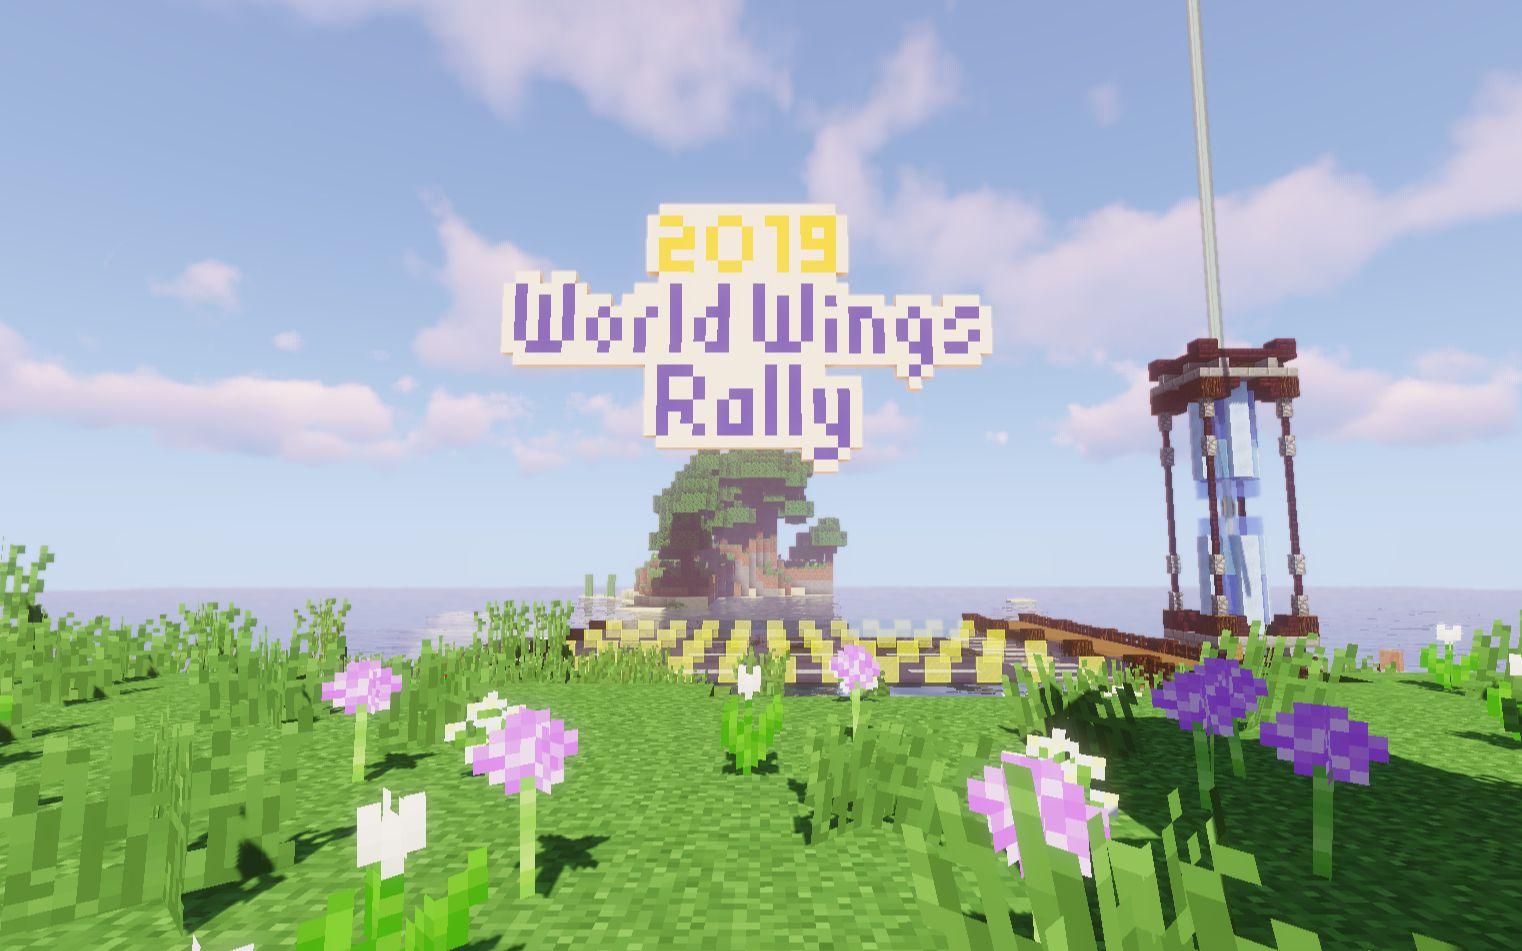 [NyaaCat] 喵窝 Minecraft 服务器 2019 夏日祭 飞行拉力赛试飞实况